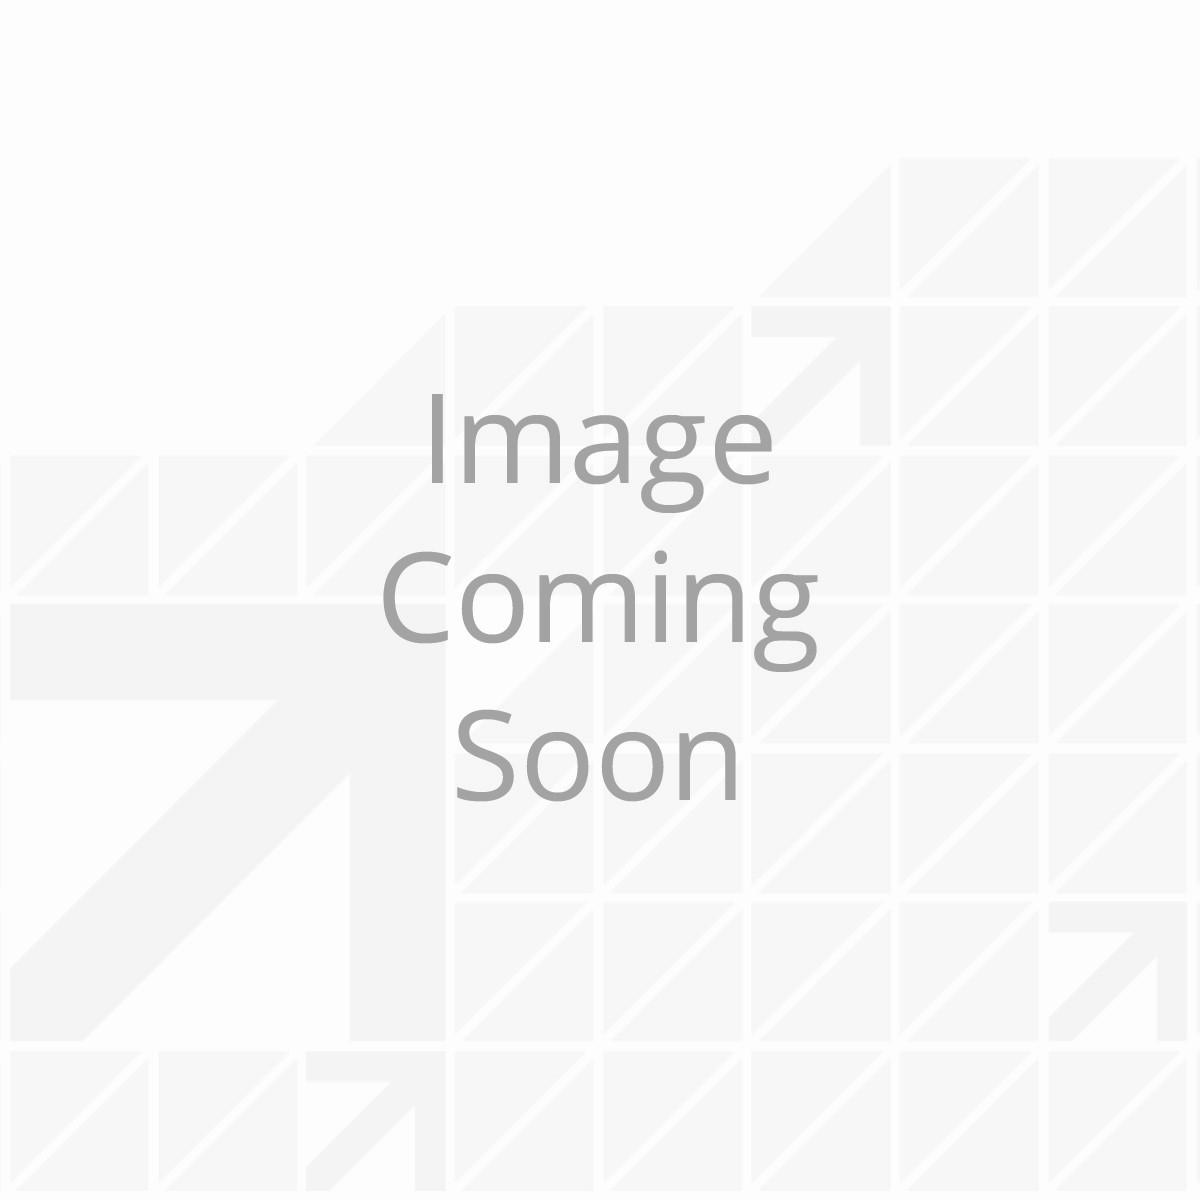 131718_-_rubber_bumper_-_001